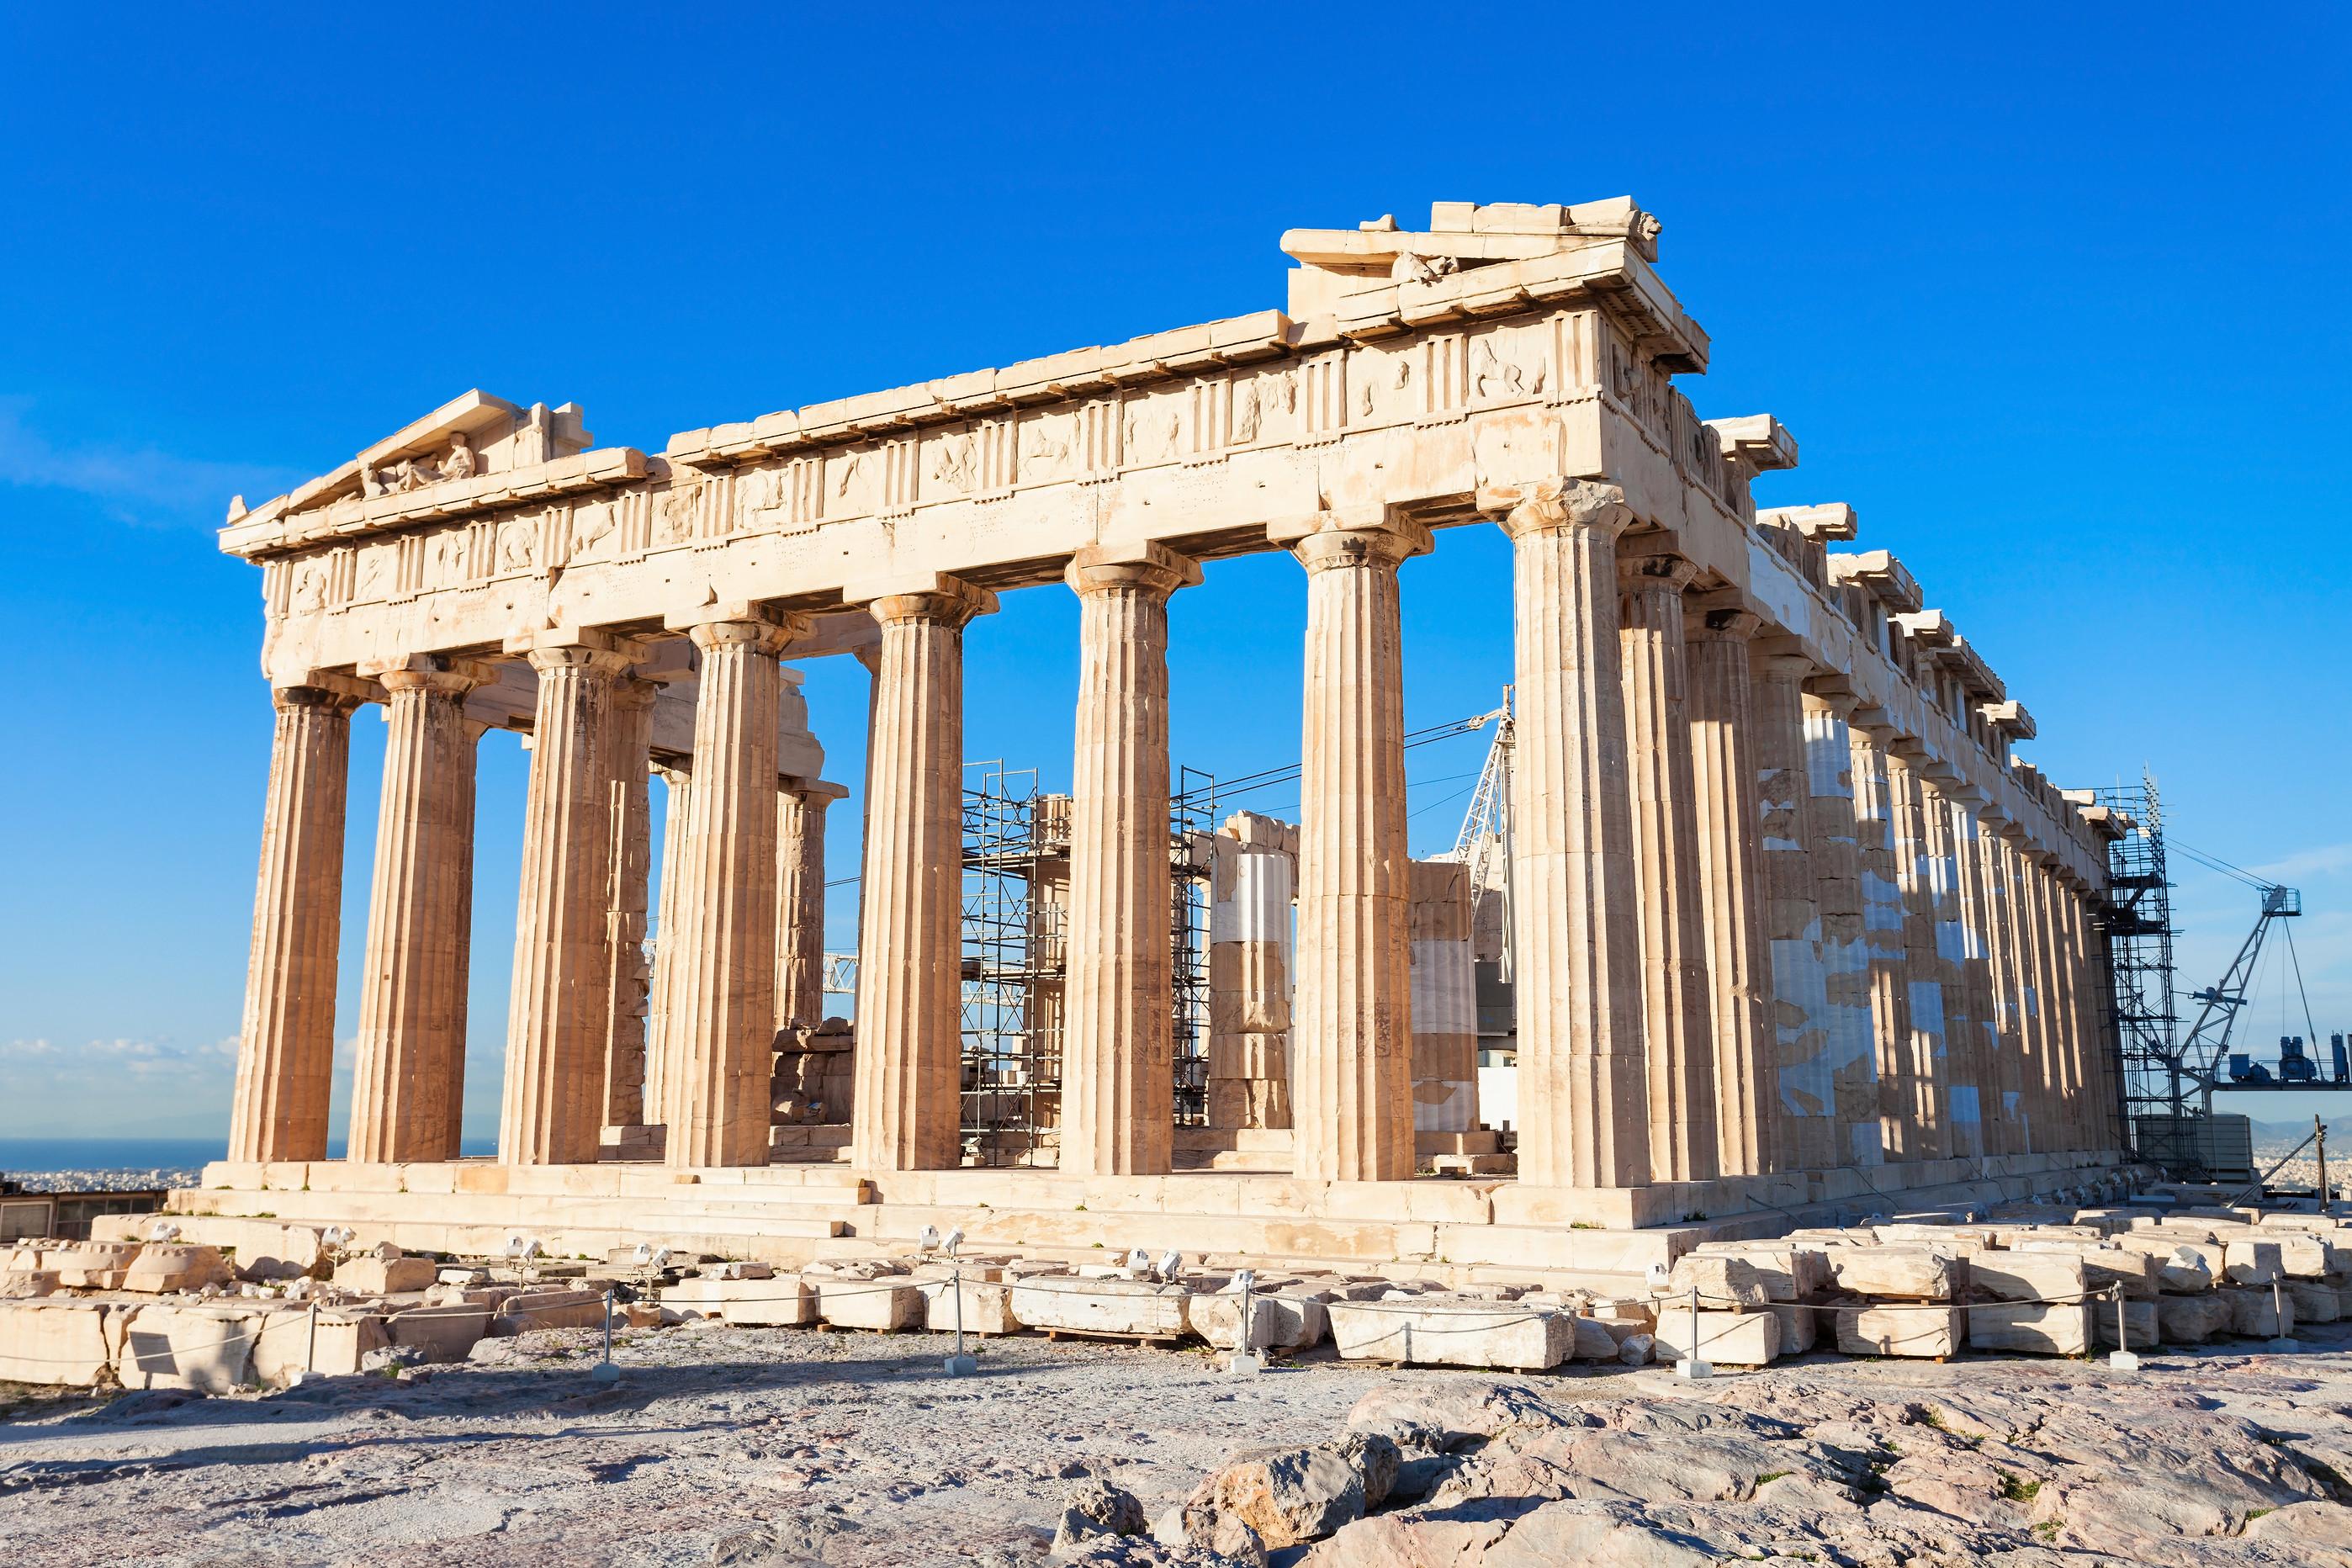 The Parthenon Temple on the Acropolis in